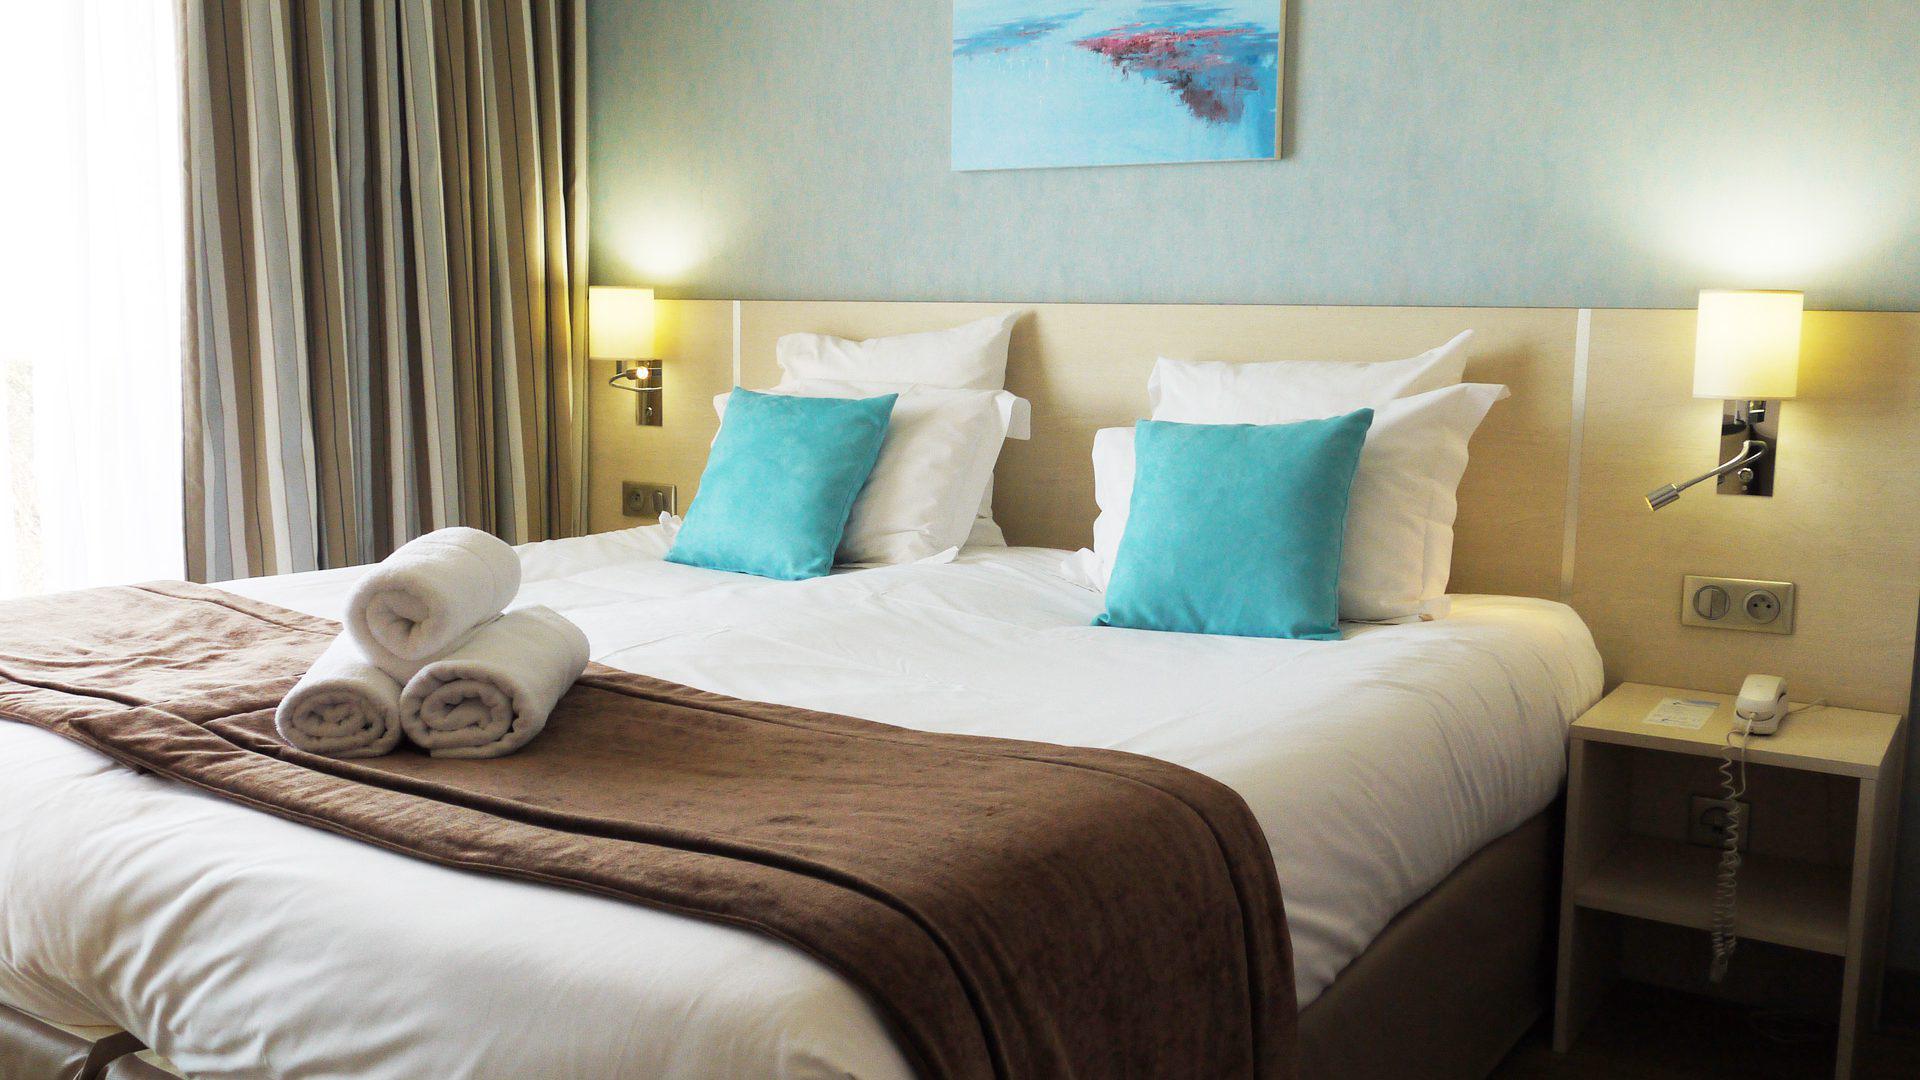 hotel-chambre-prestige-vue-mer-quiberon-hotel-europa-diaporama